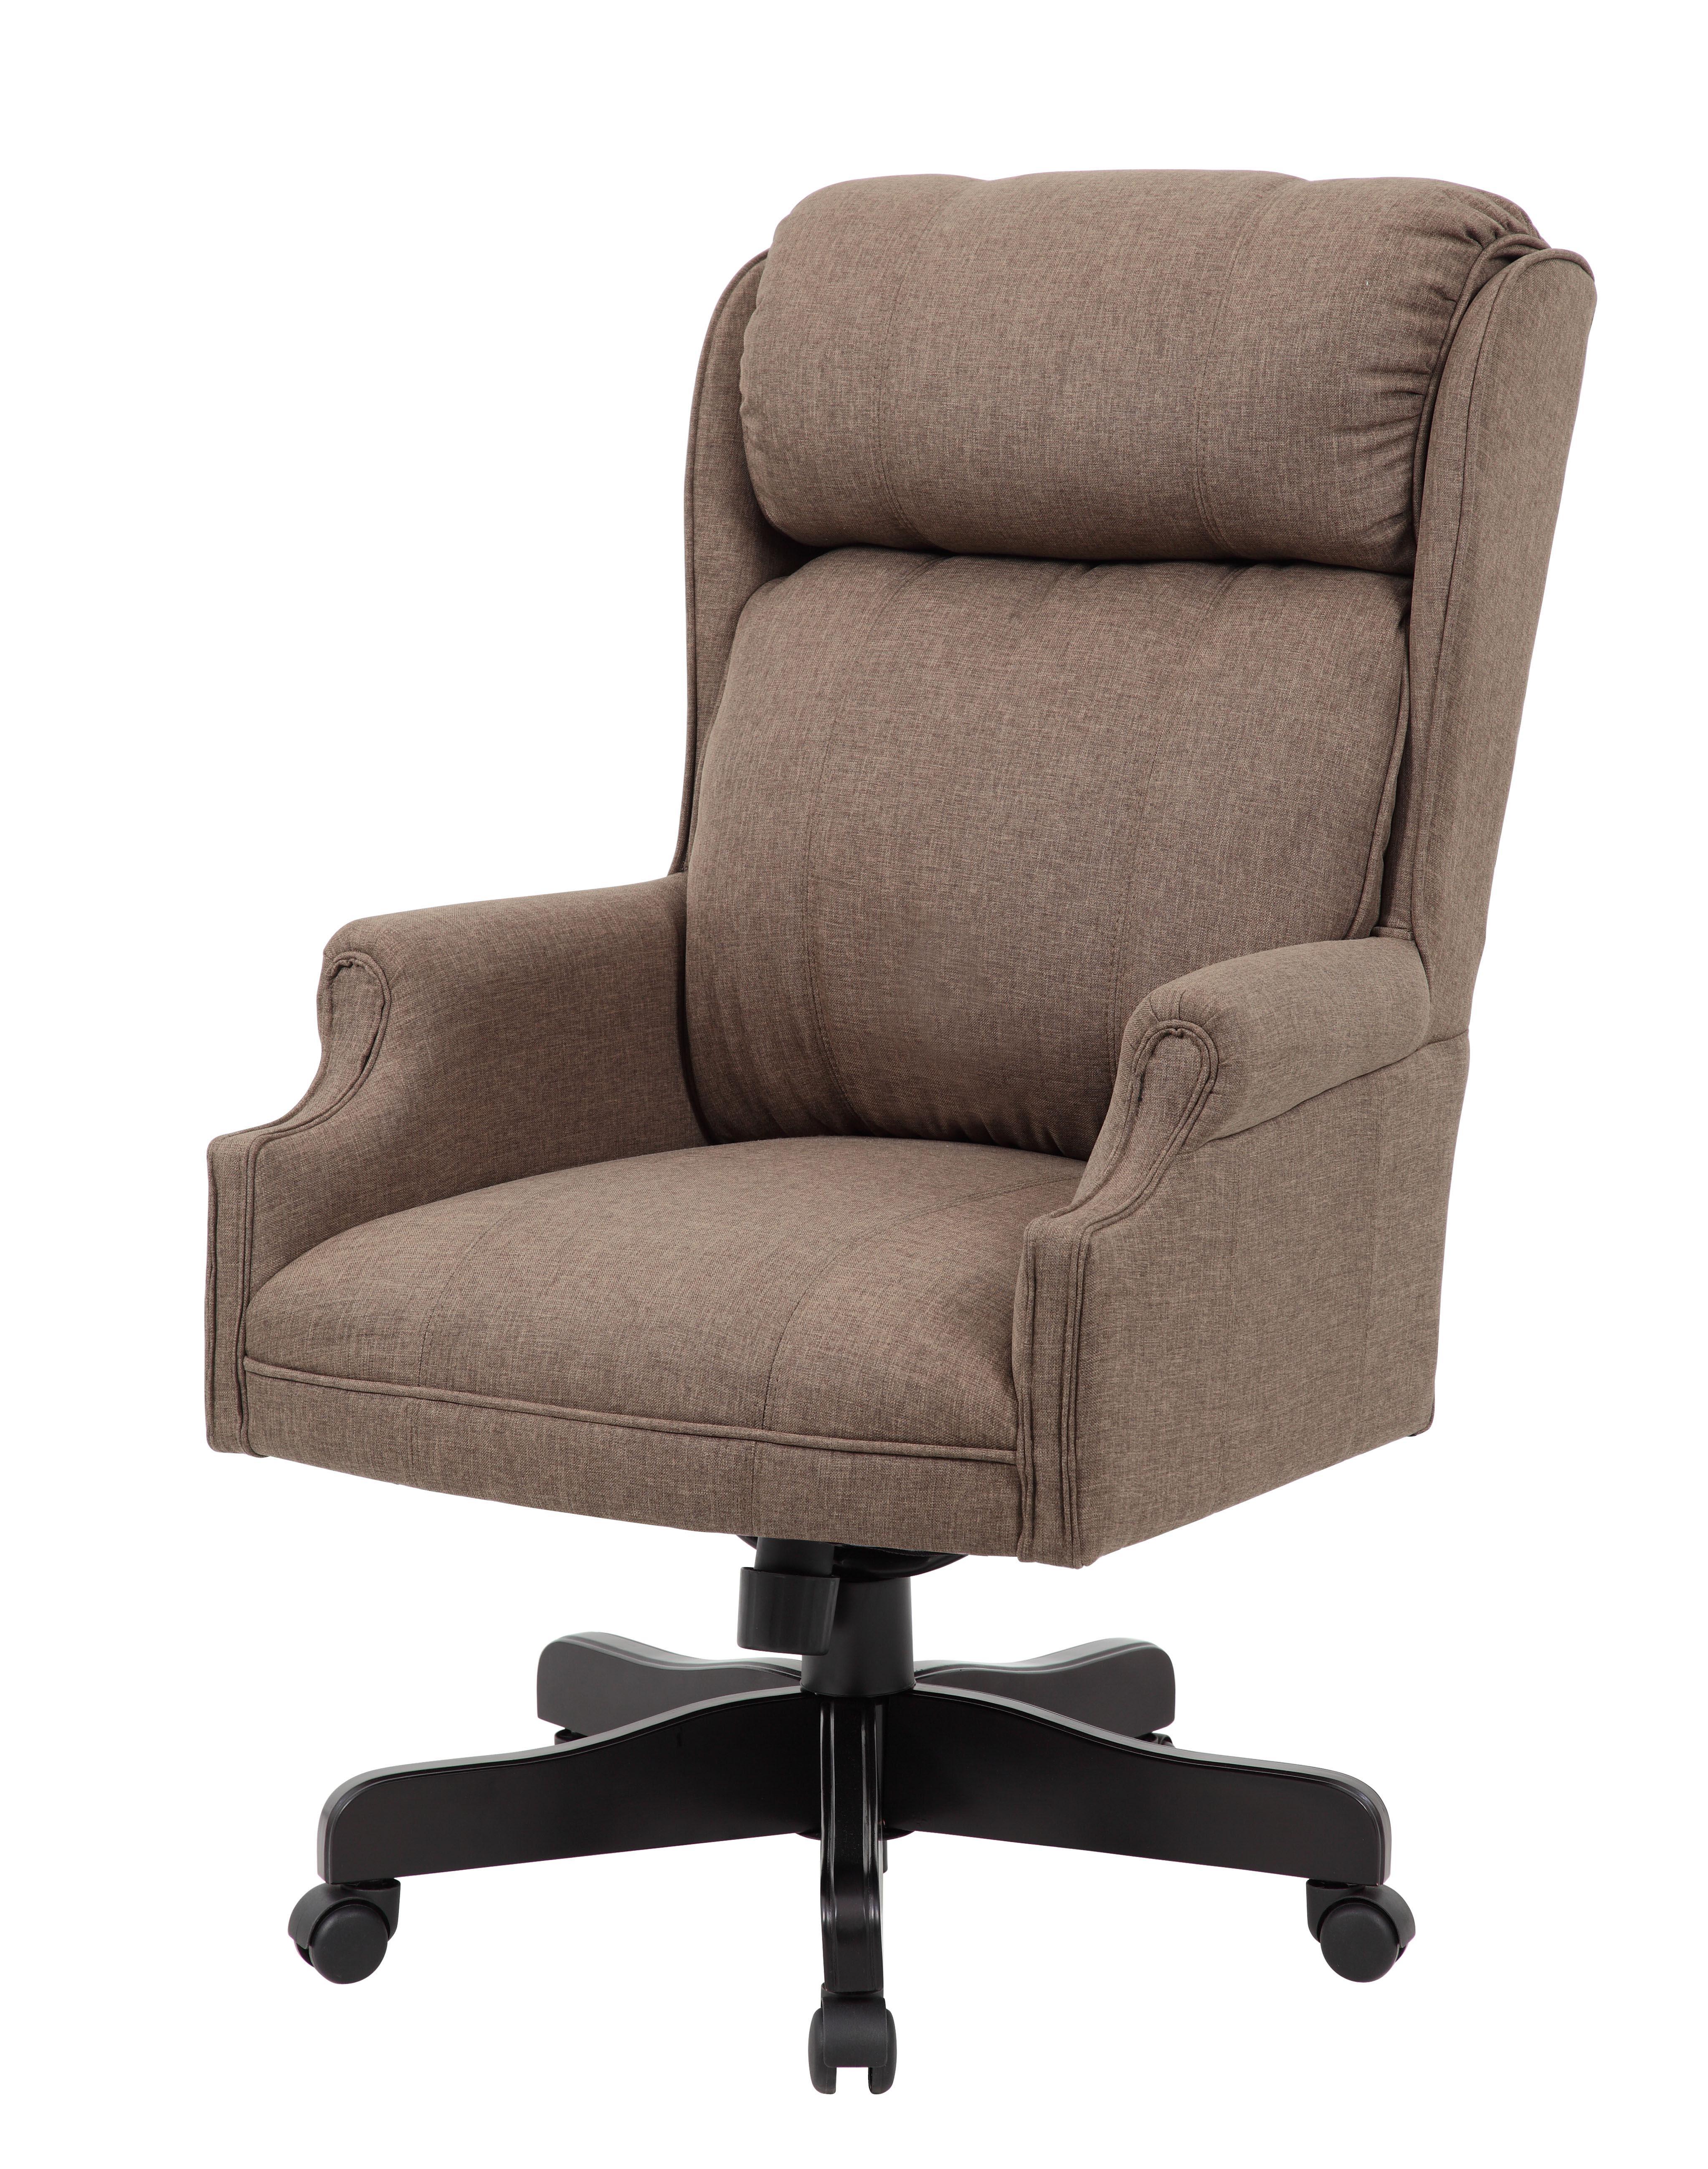 Boss High Back mercial Grade Linen Chair With Black Base B980BK